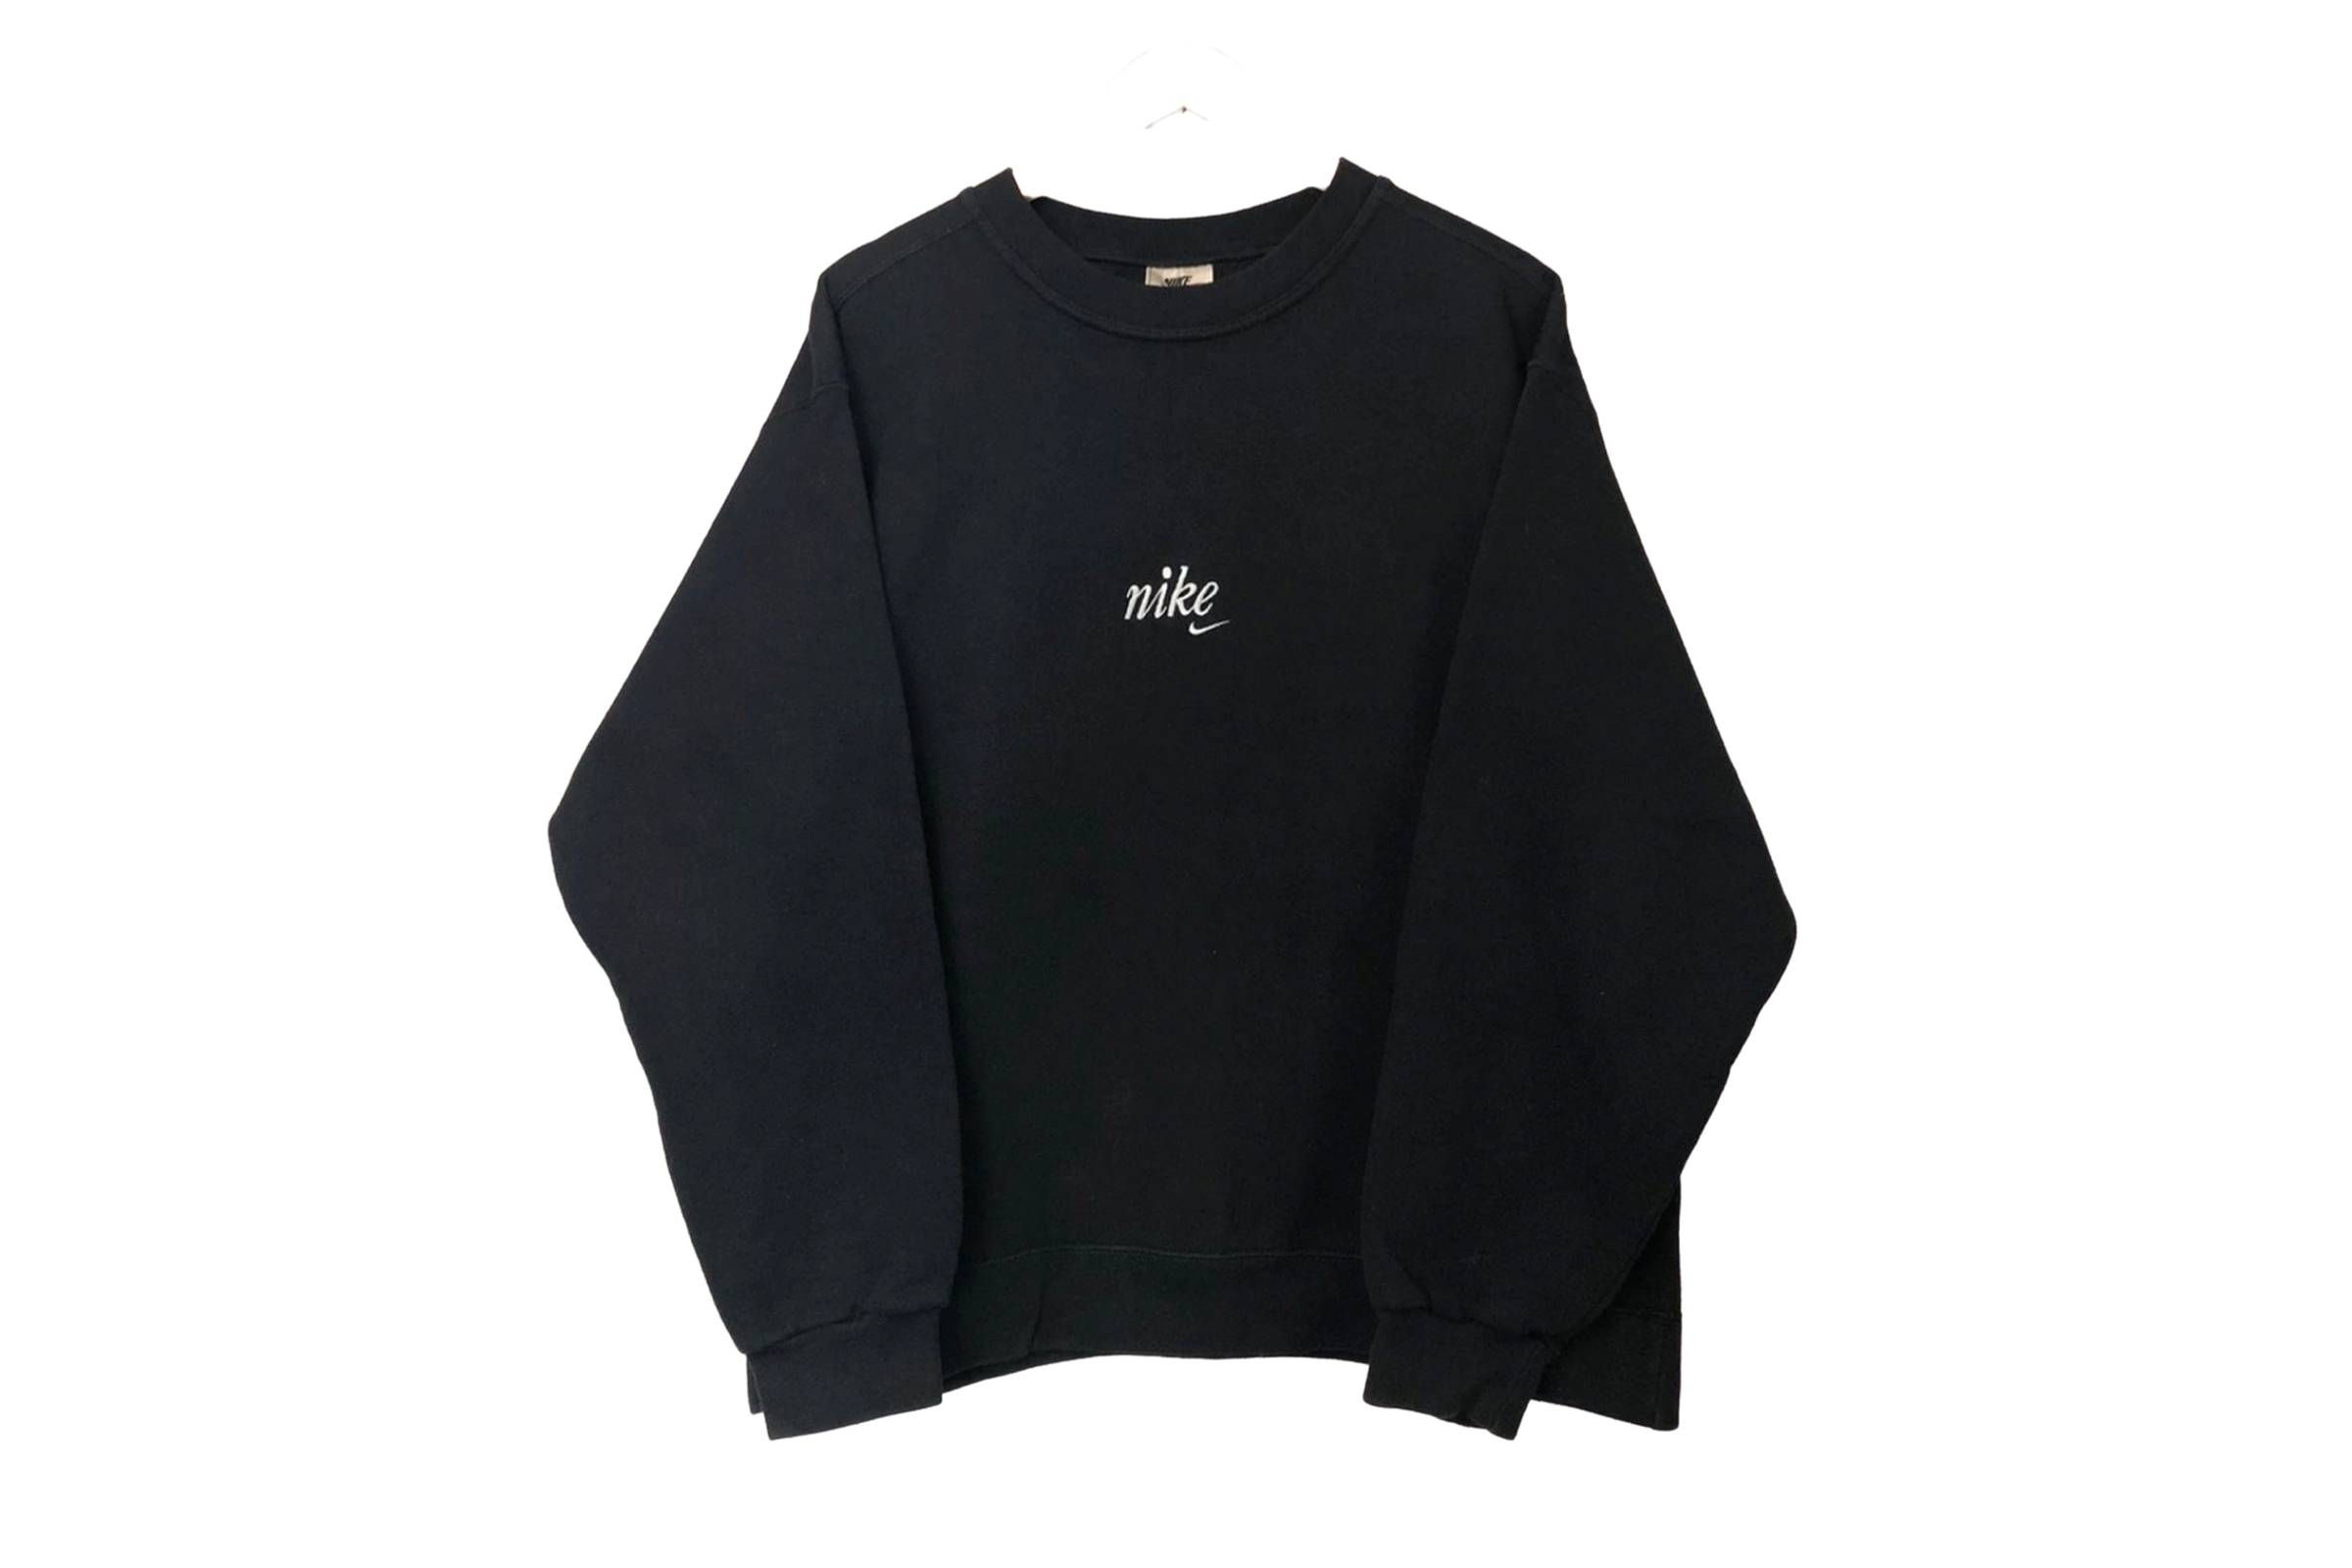 Nike Vintage Logo Crewneck Sweater